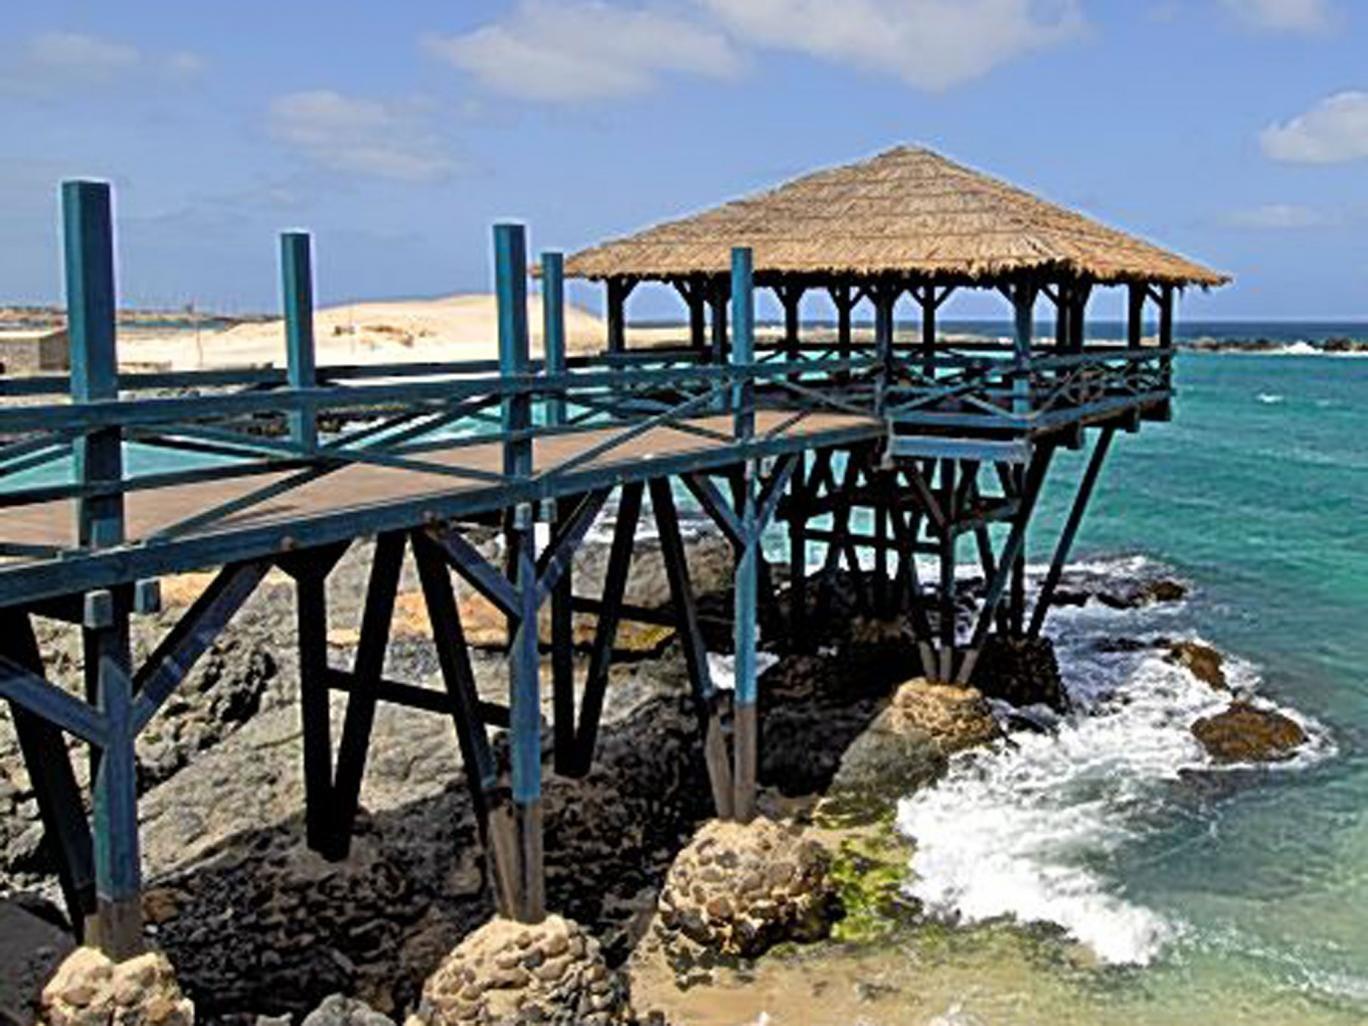 Late escape: grab a break in Cape Verde